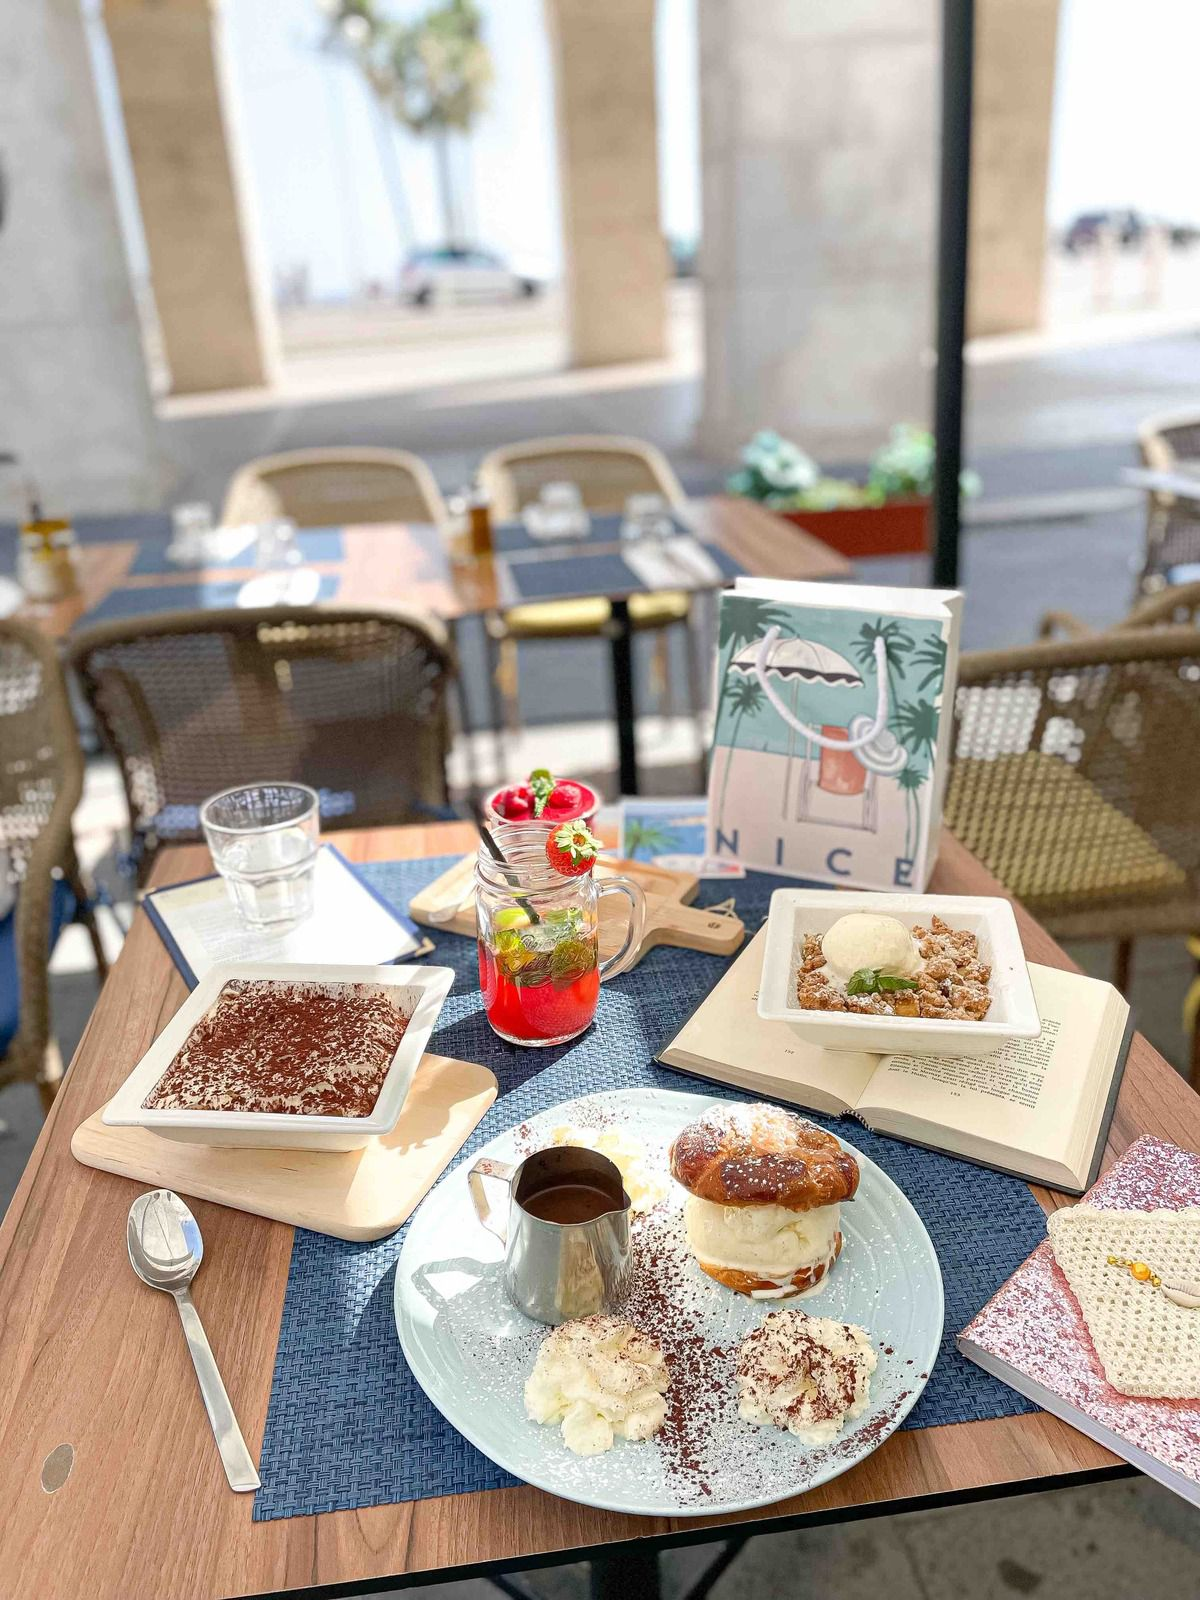 Casa Leya : un bon resto italien sur le Cours Saleya {Nice}